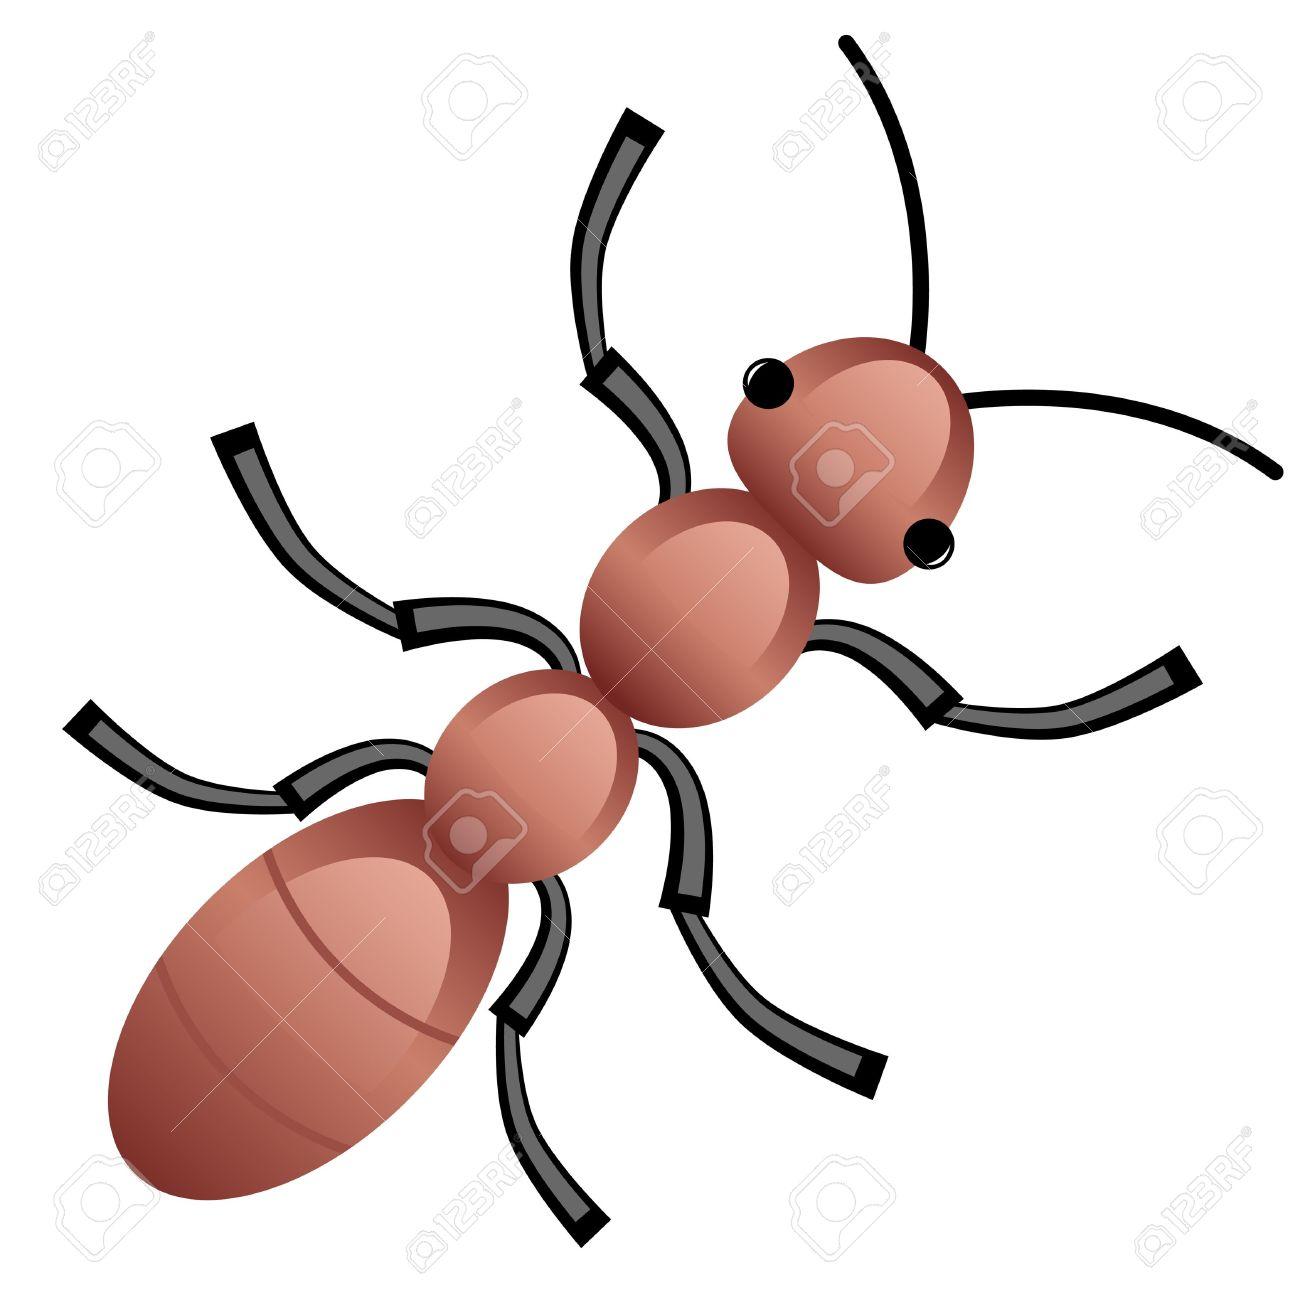 Insect clipart insect leg, Insect insect leg Transparent.